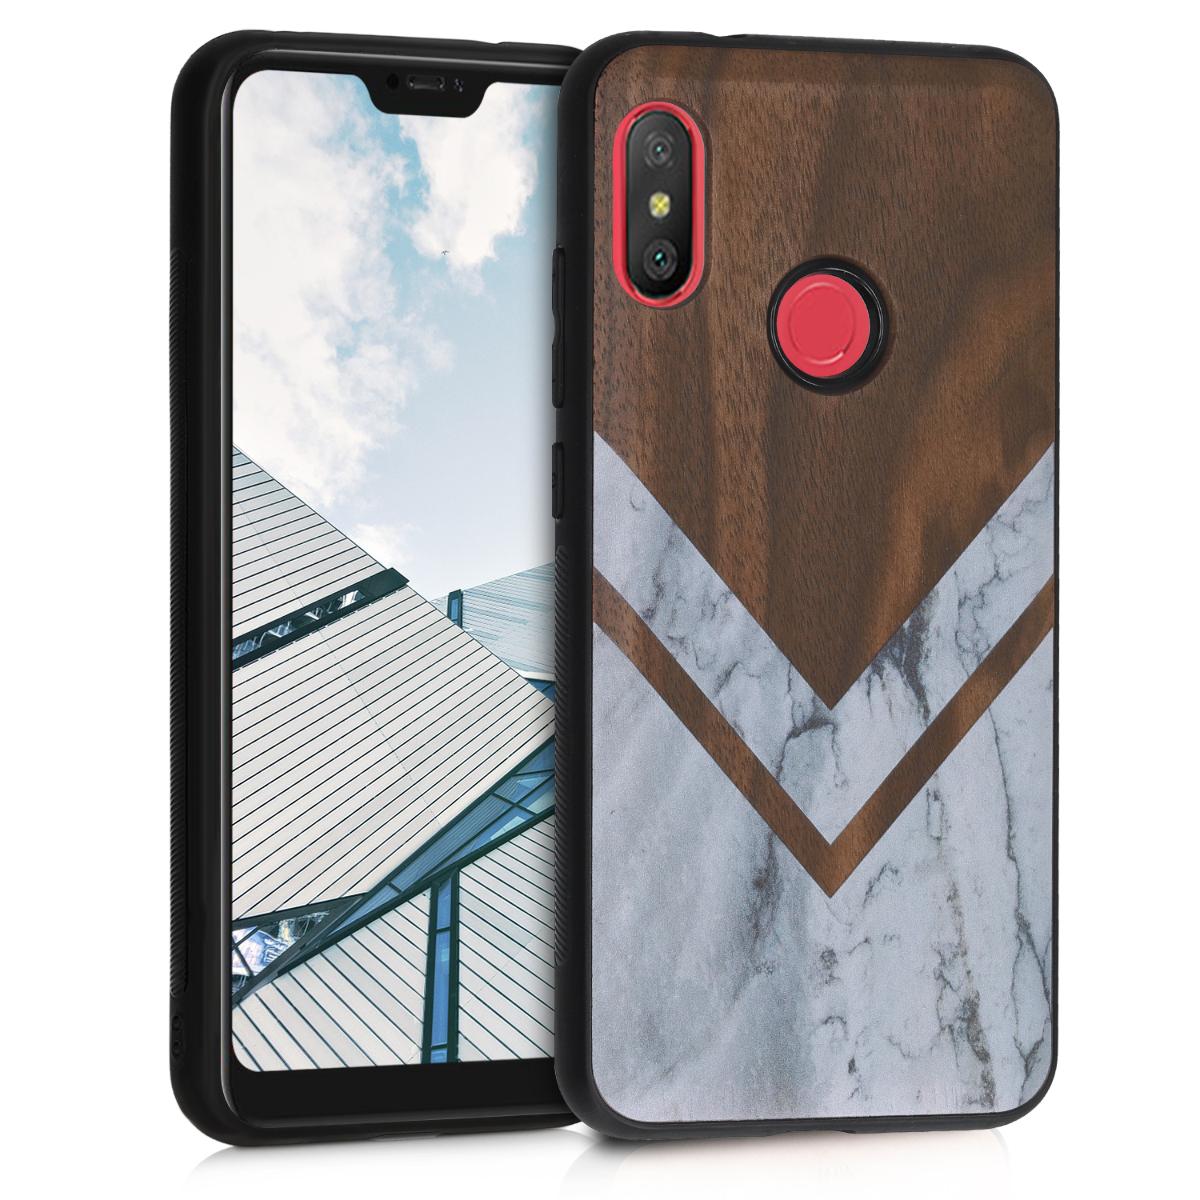 KW Ξύλινη Θήκη Xiaomi Redmi 6 Pro / Mi A2 Lite - Wood and Marble (46171.03)